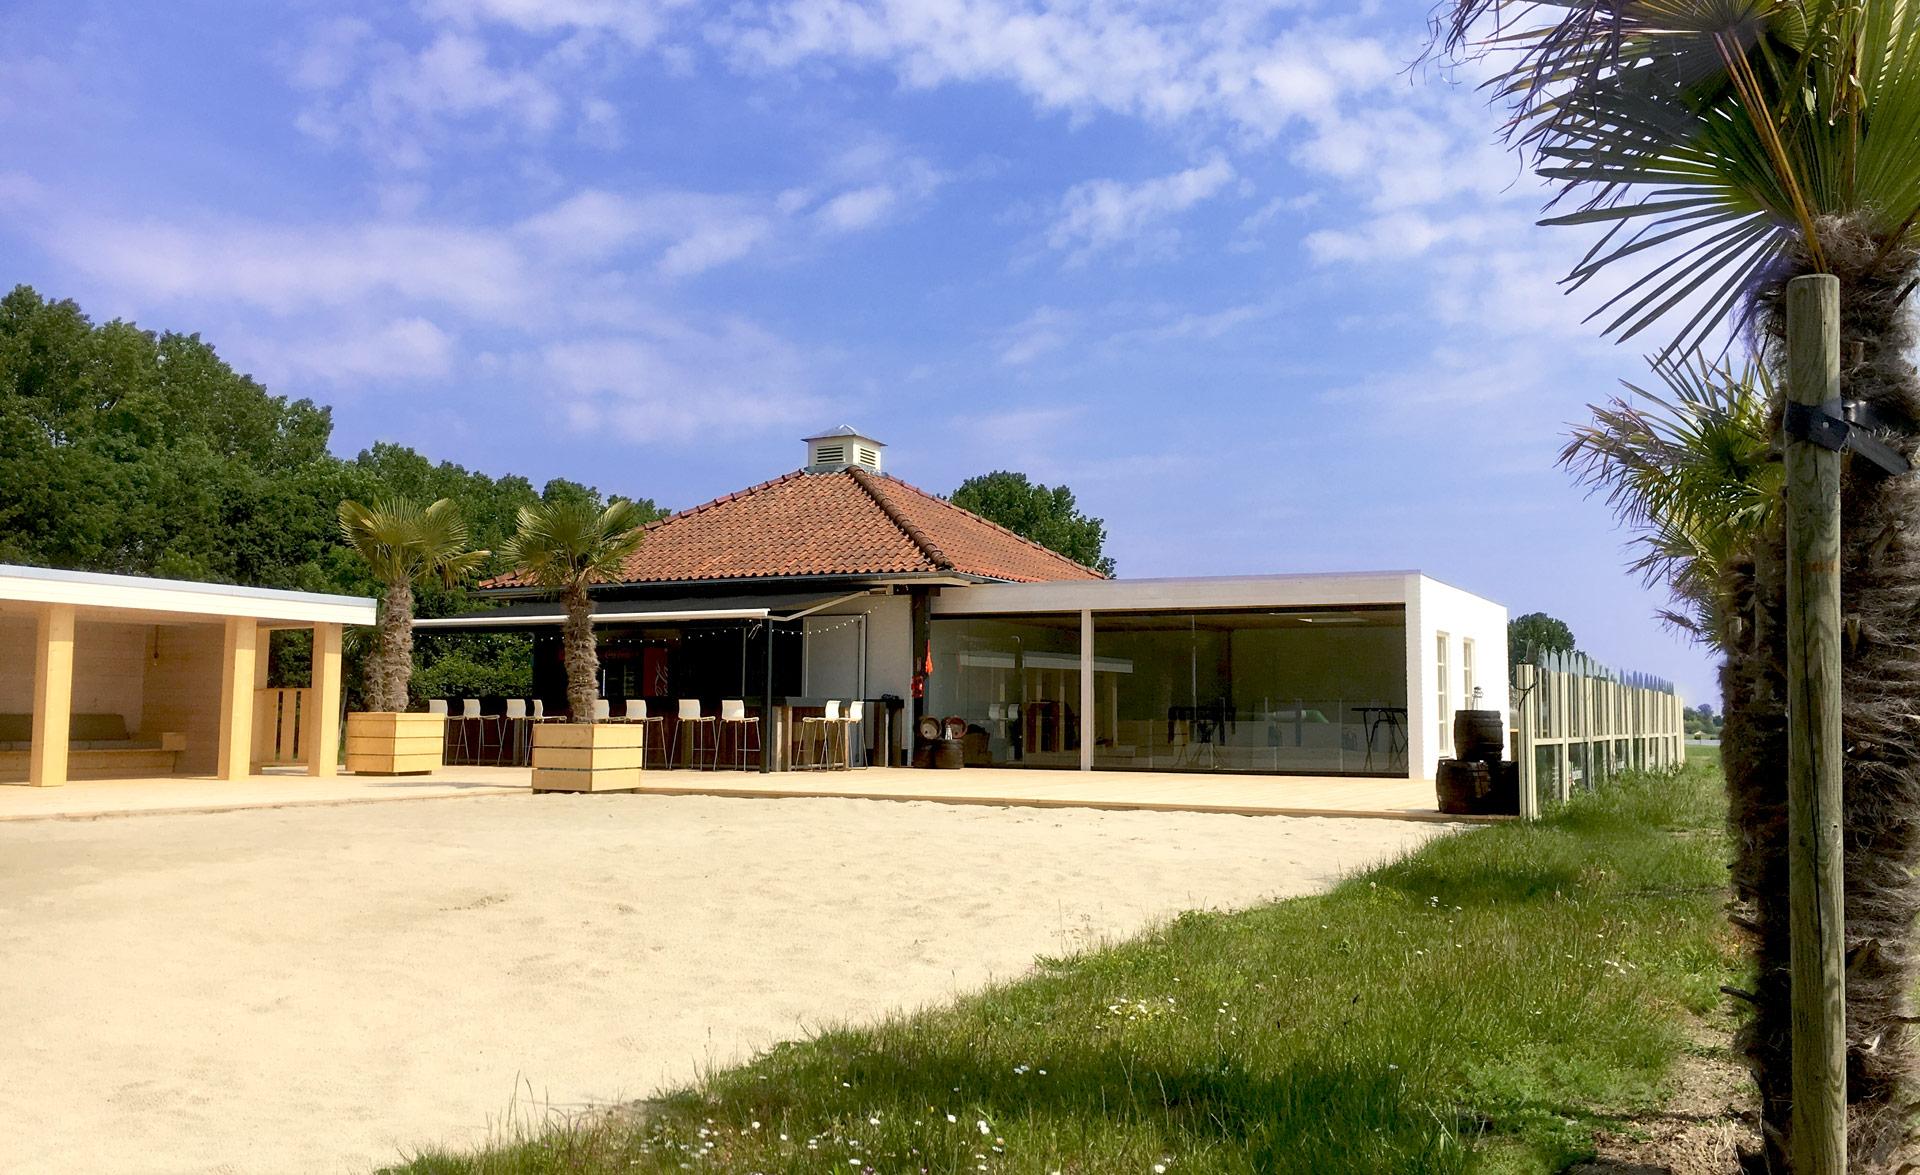 Area-X-De-Weerd-Roermond-Beachclub-Palm-Beach-4b